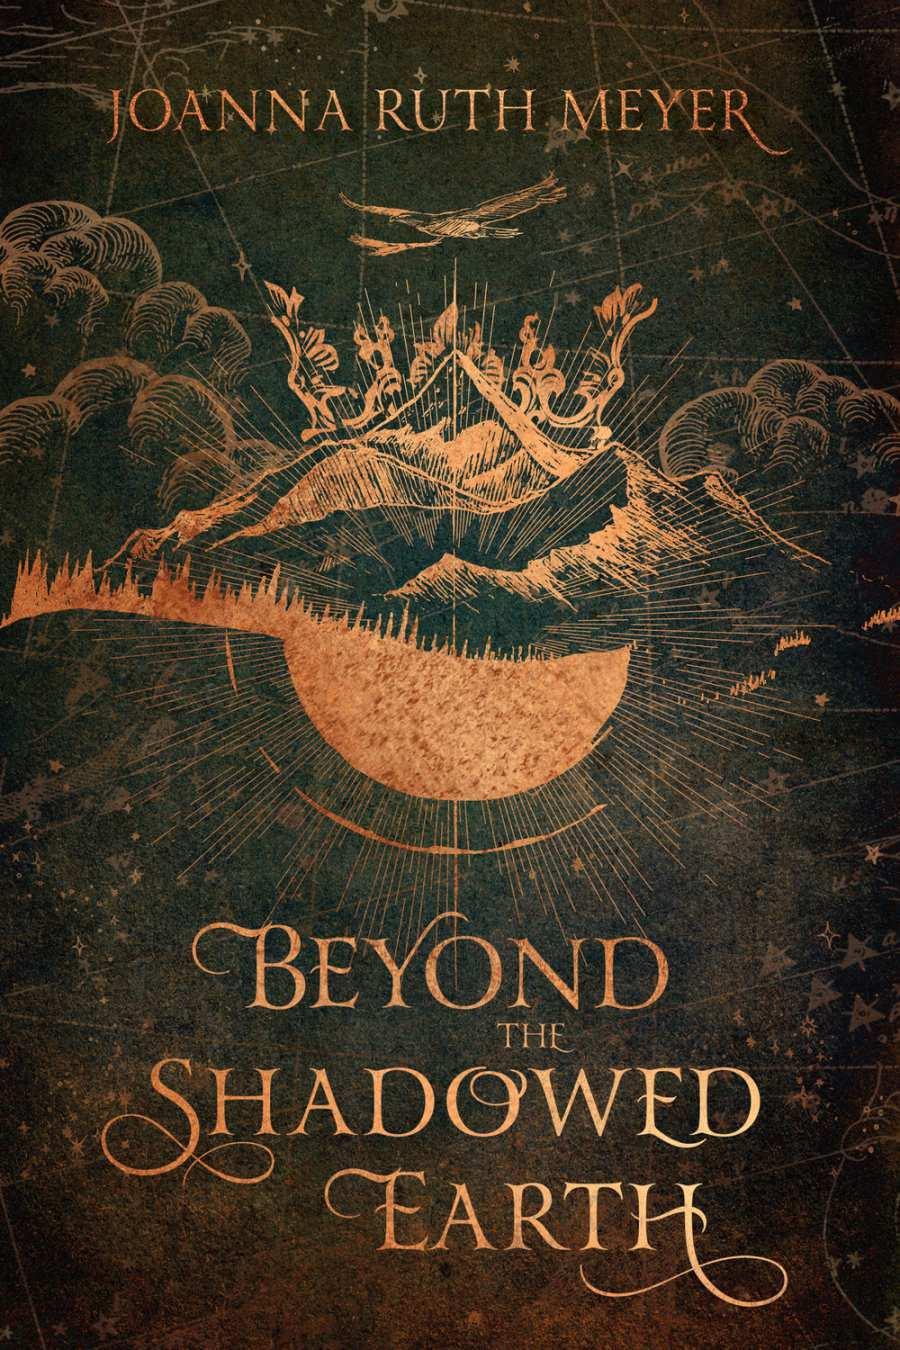 Beyond the Shadowed Earth - Joanna Ruth Meyer